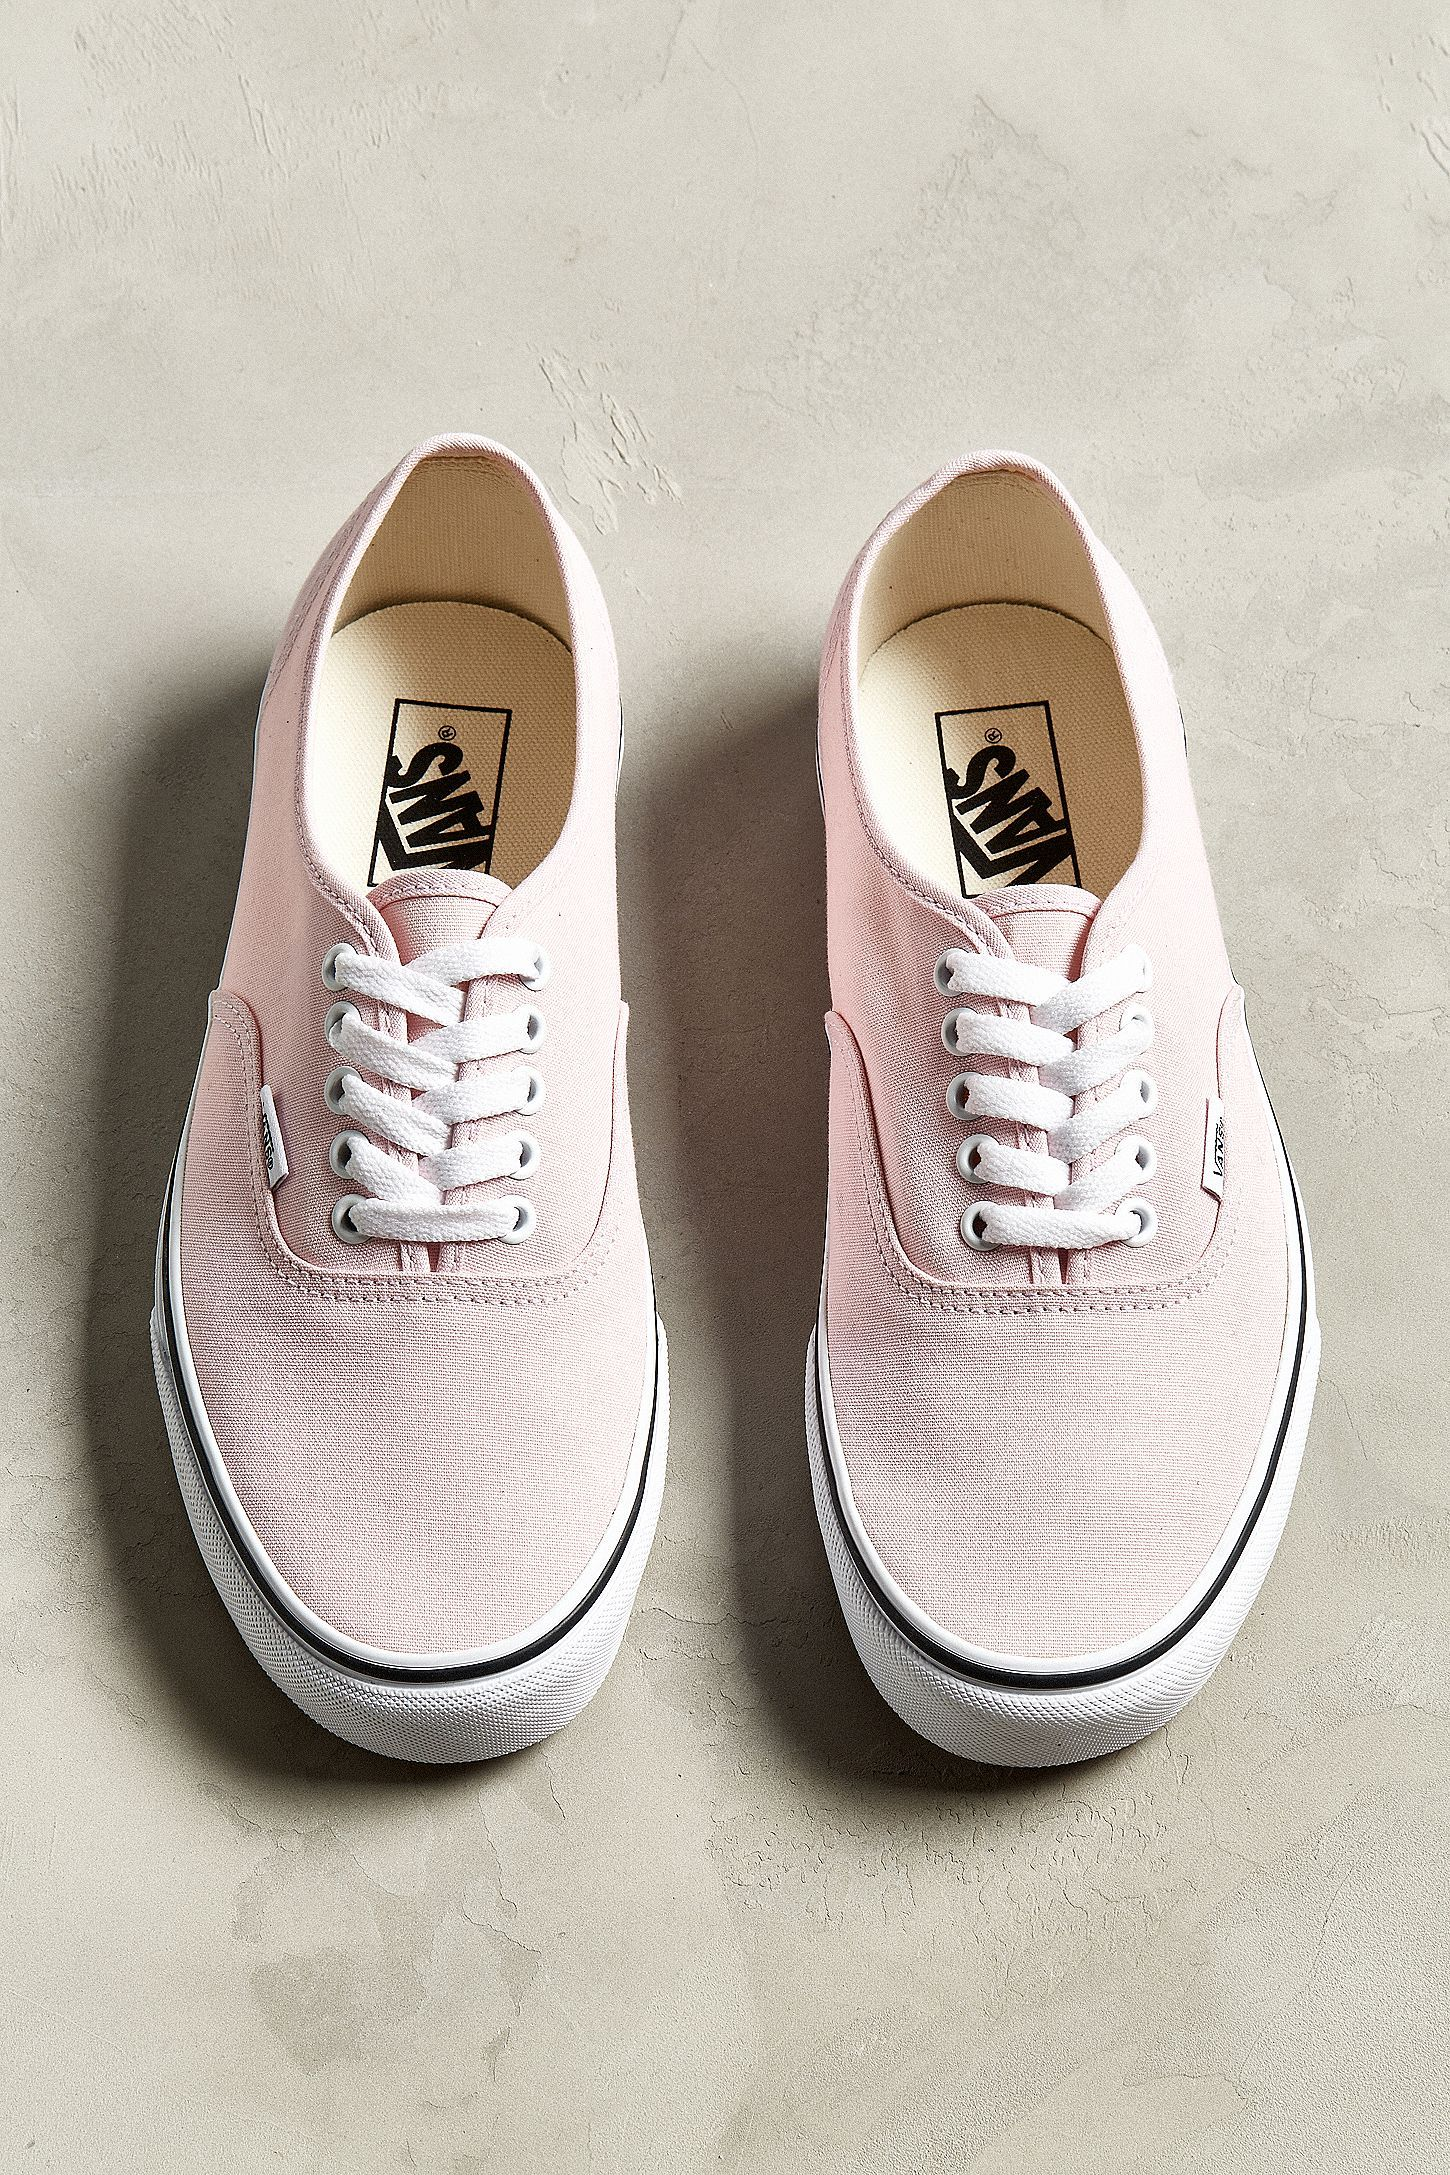 10401632d9 Slide View  5  Vans Authentic Sneaker